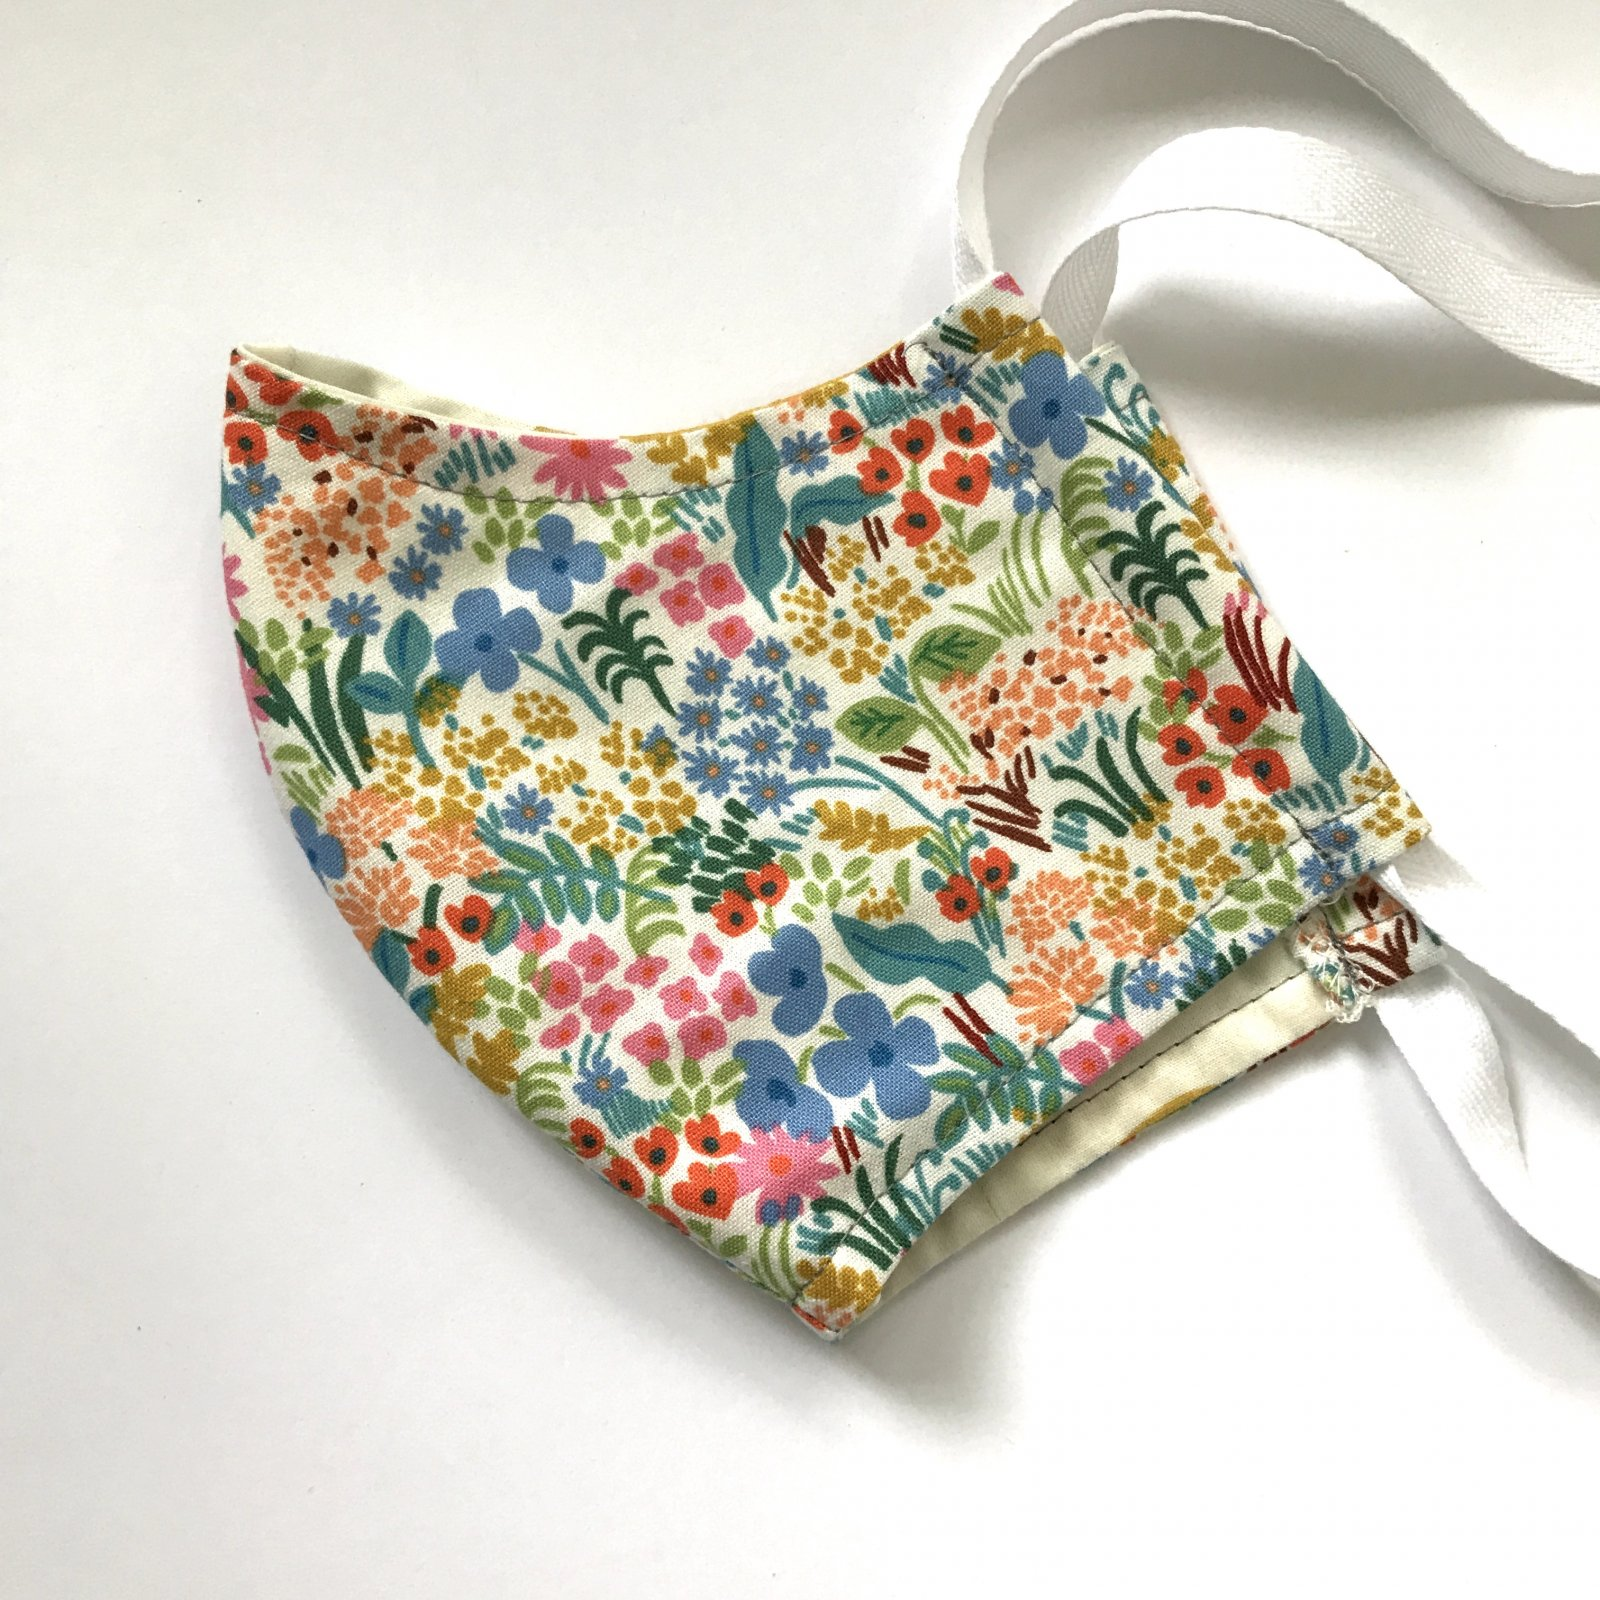 Child Size Contoured Cotton Drawstring Mask - Multi Floral